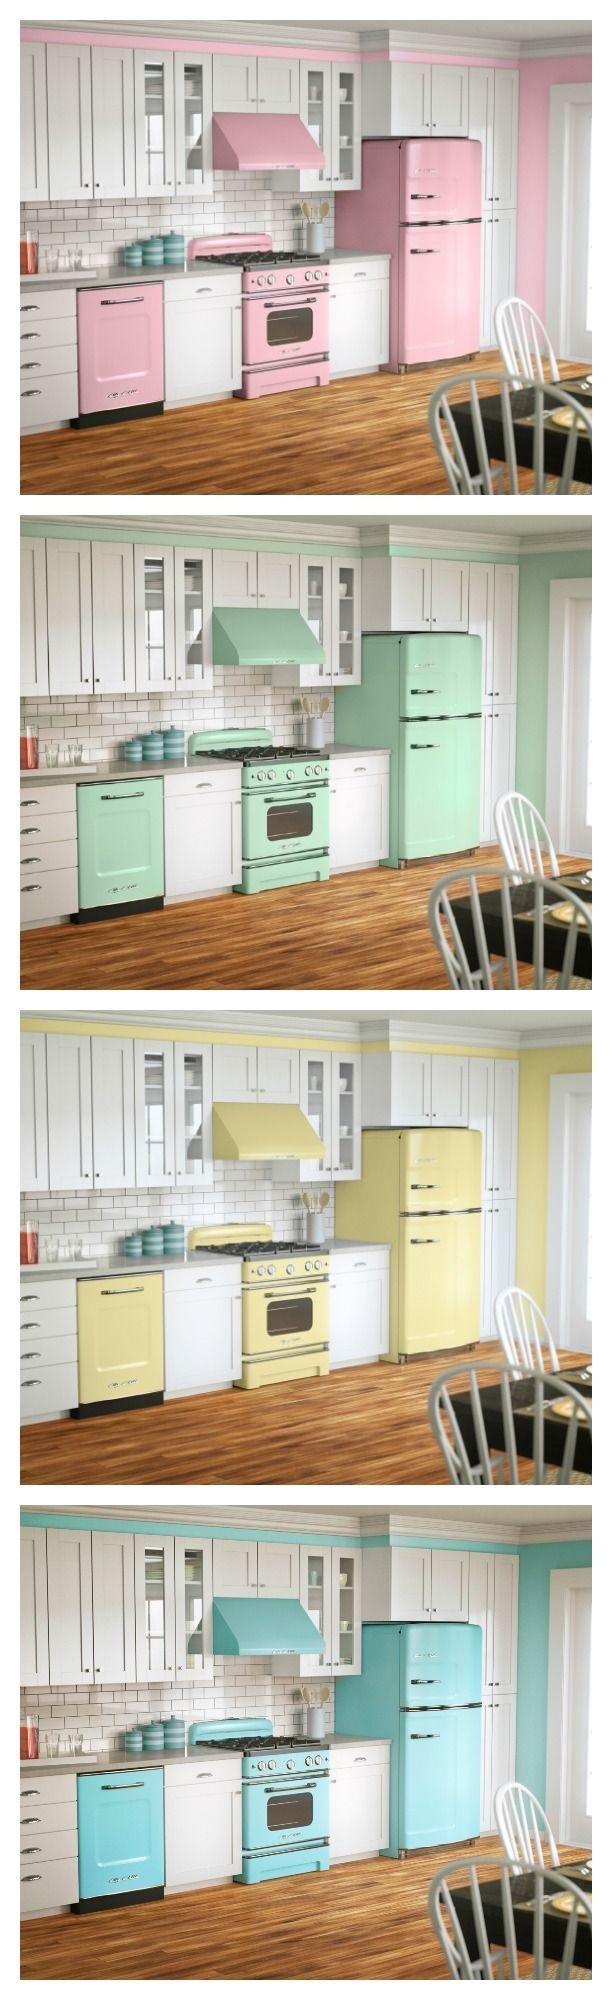 14 Best Perfect Pastel Kitchen Images On Pinterest Retro